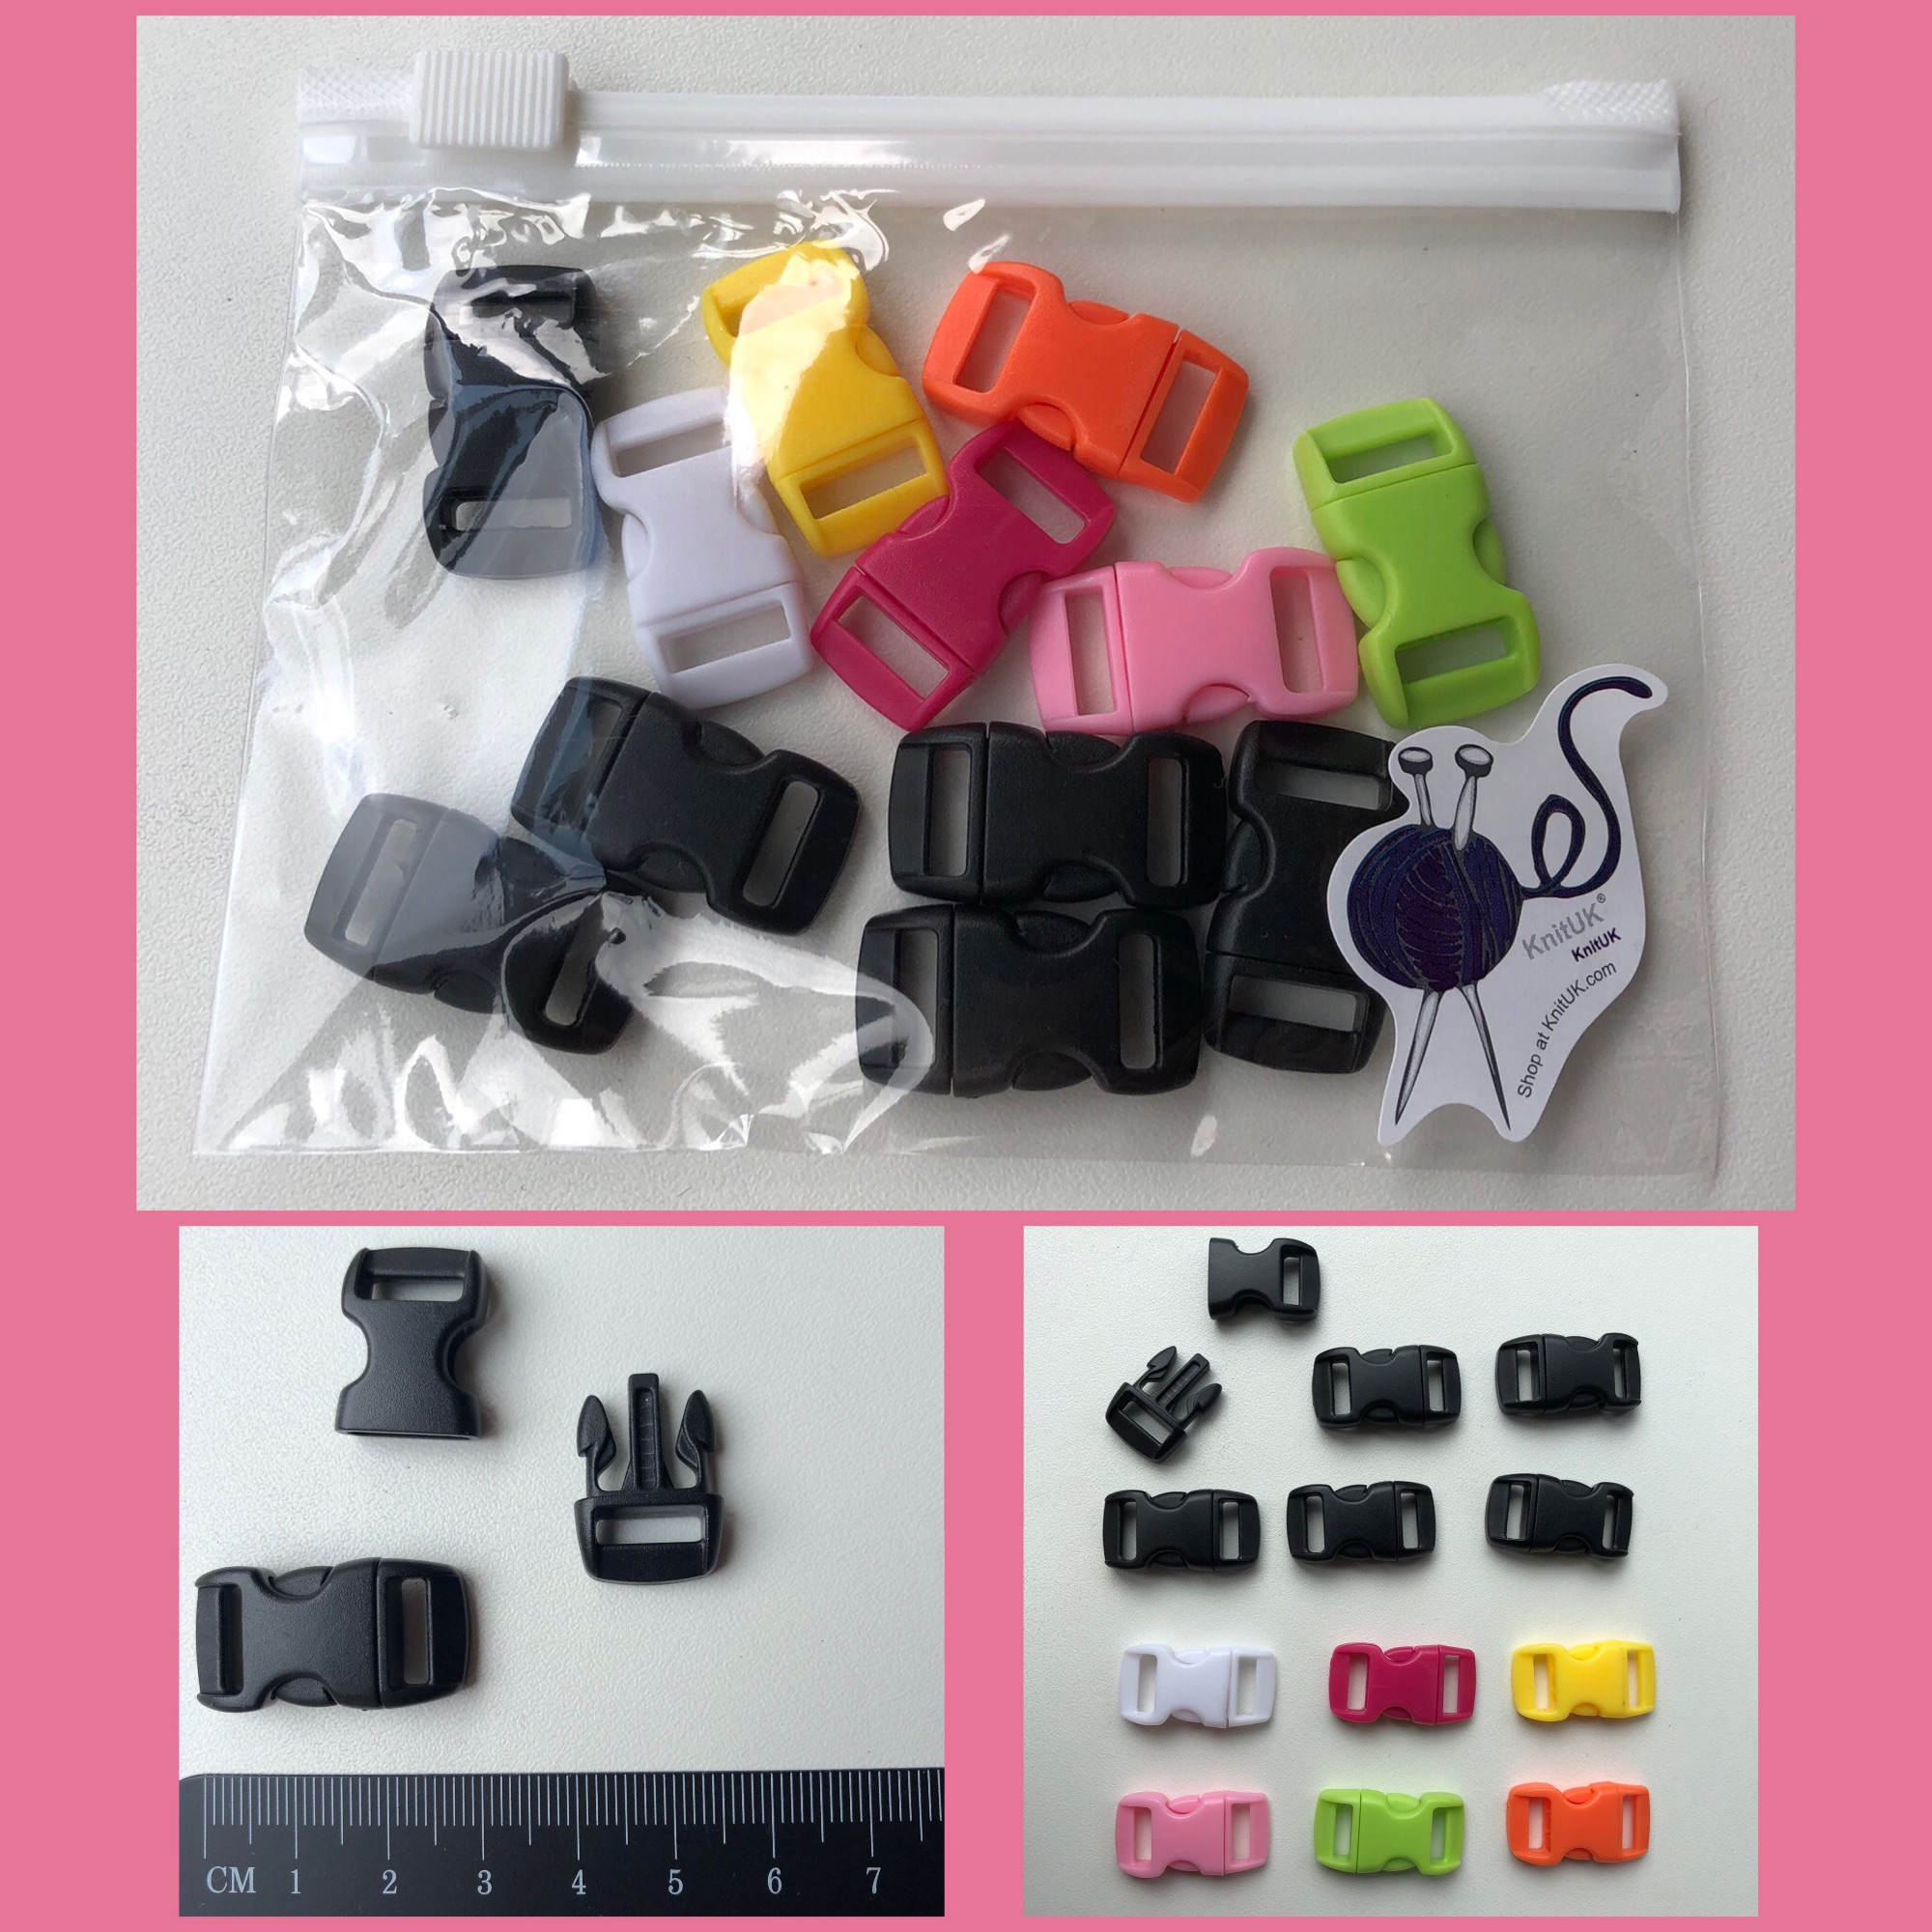 Knituk plasti buckles for paracord bracelet mix colour black 12 pack